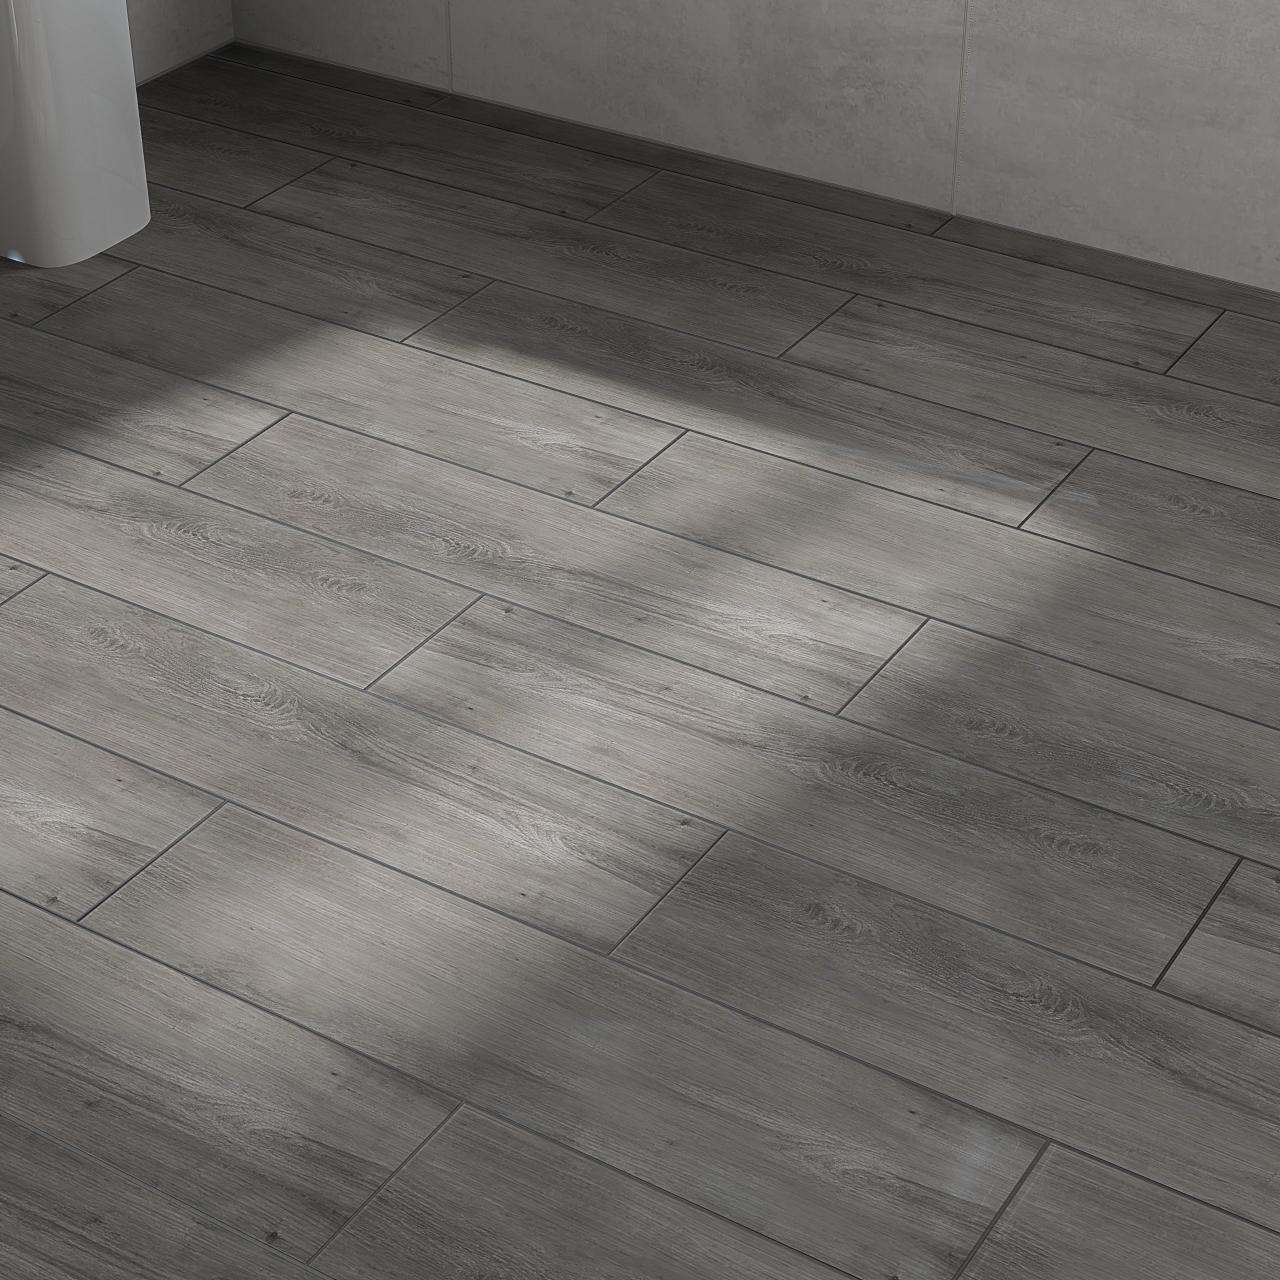 Scandinavia Grey 15 5cm X 62cm Porcelain Tile In 2020 Porcelain Tile Tiles Gray Porcelain Tile